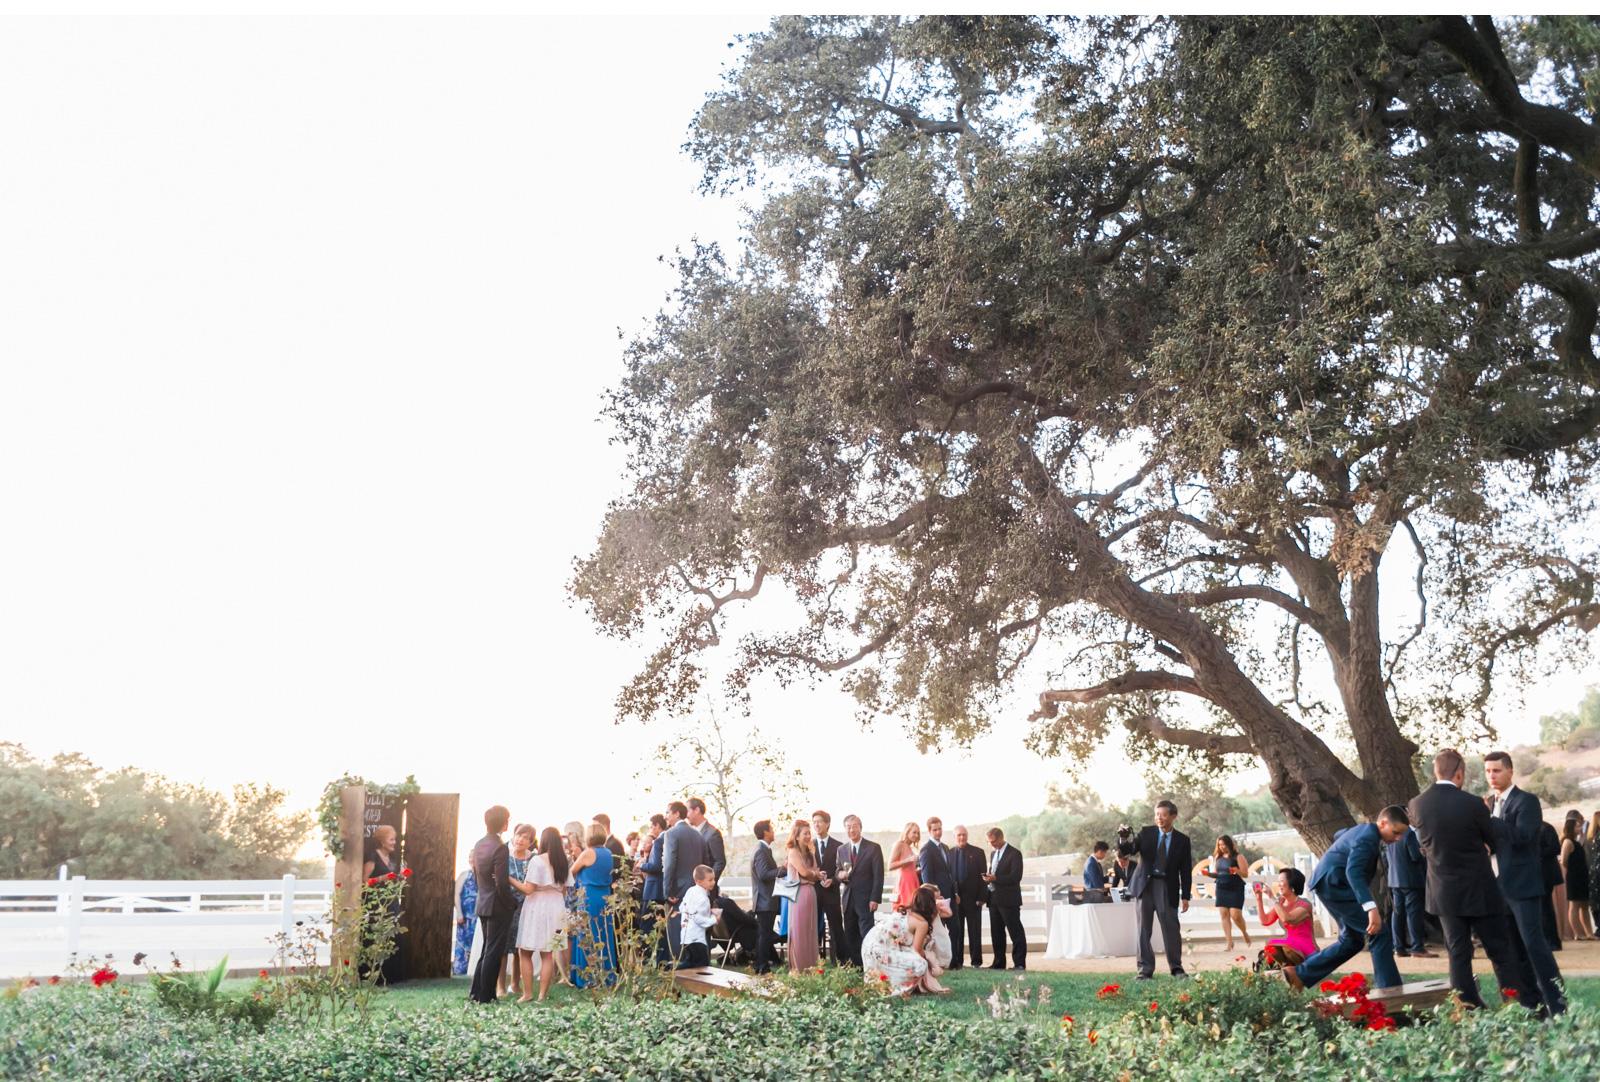 California-Wedding-Photographer-Style-Me-Pretty-Natalie-Schutt-San-Luis-Obispo_11.jpg